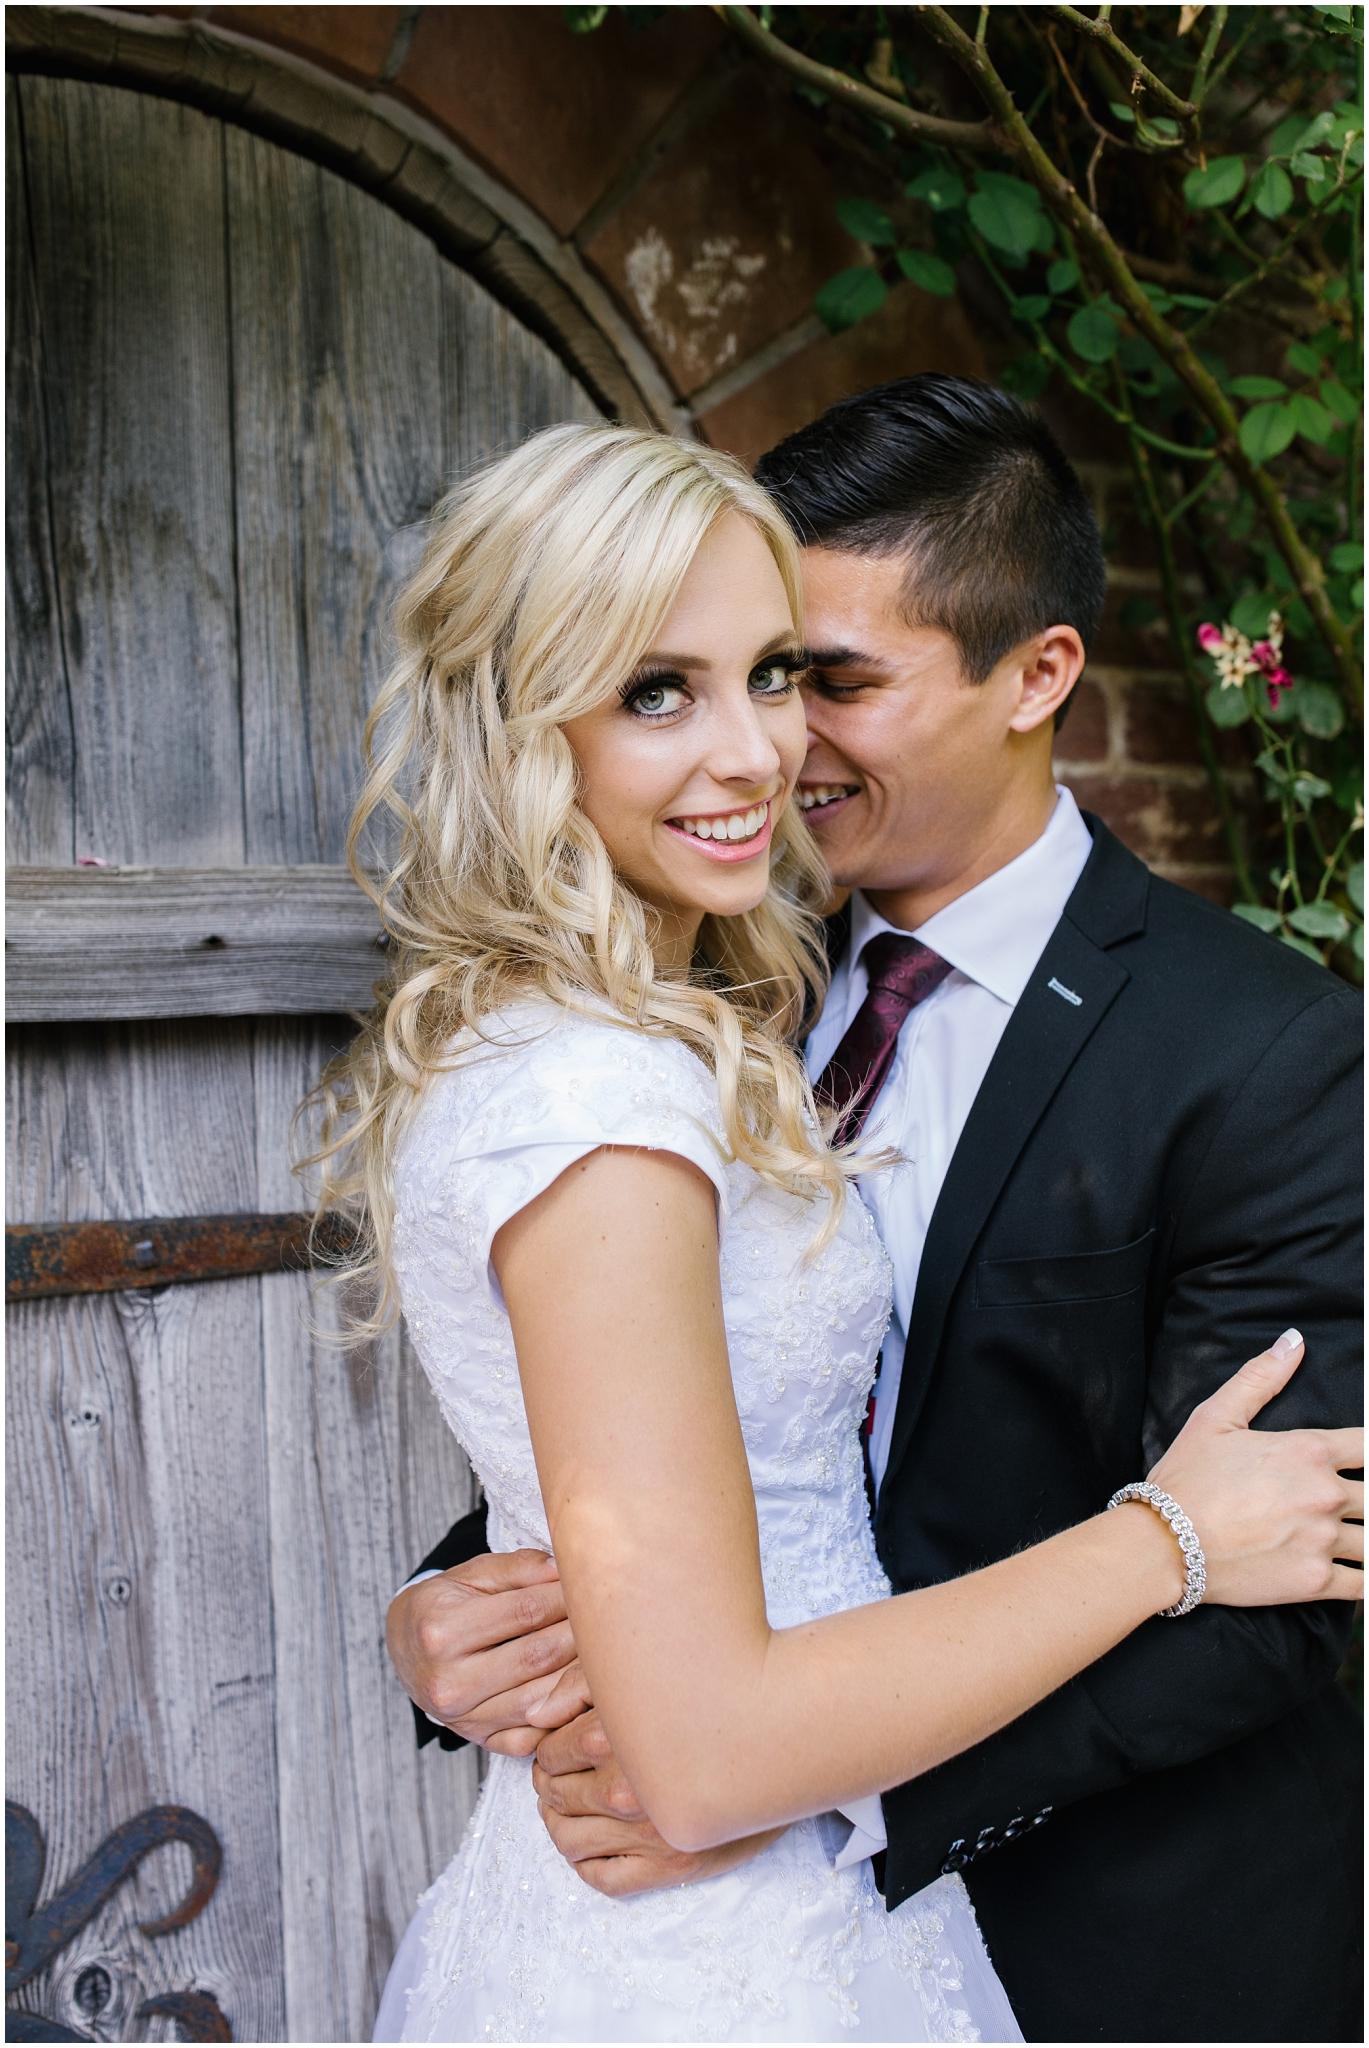 CHBridals-5_Lizzie-B-Imagery-Utah-Wedding-Photographer-Salt-Lake-City-Park-City-Thanksgiving-Point-Ashton-Gardens.jpg